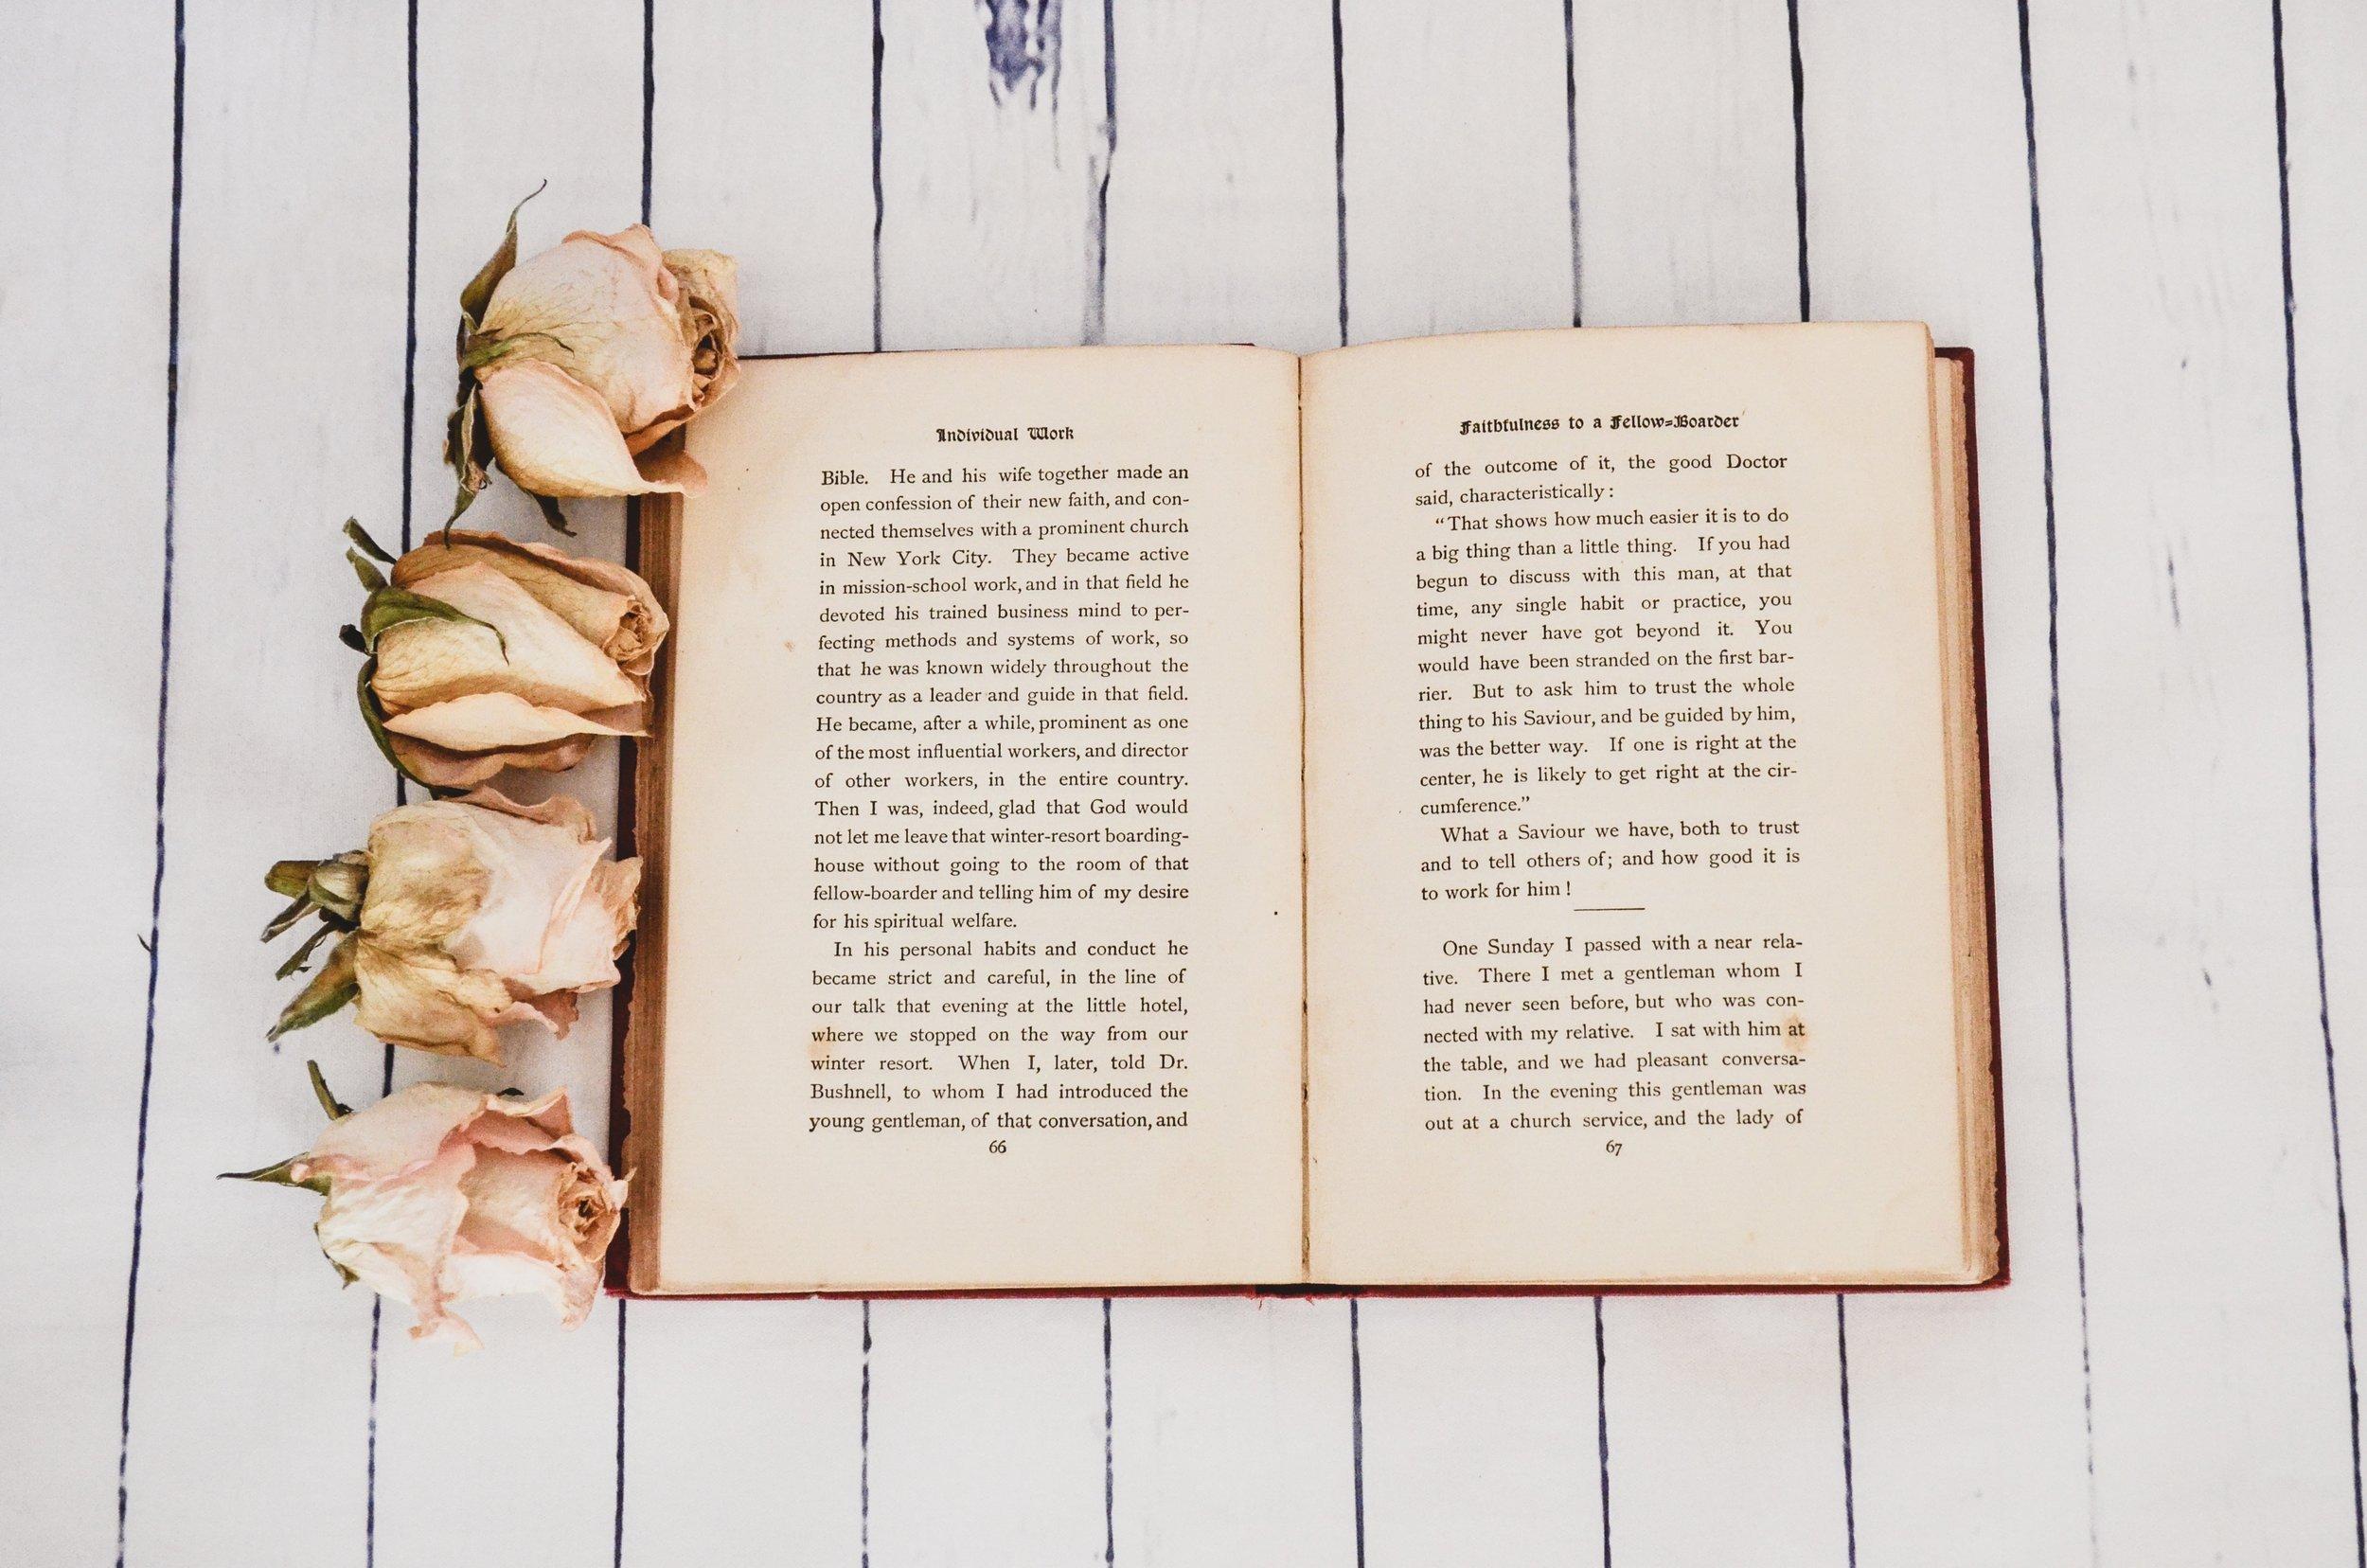 Books like Jane Austen